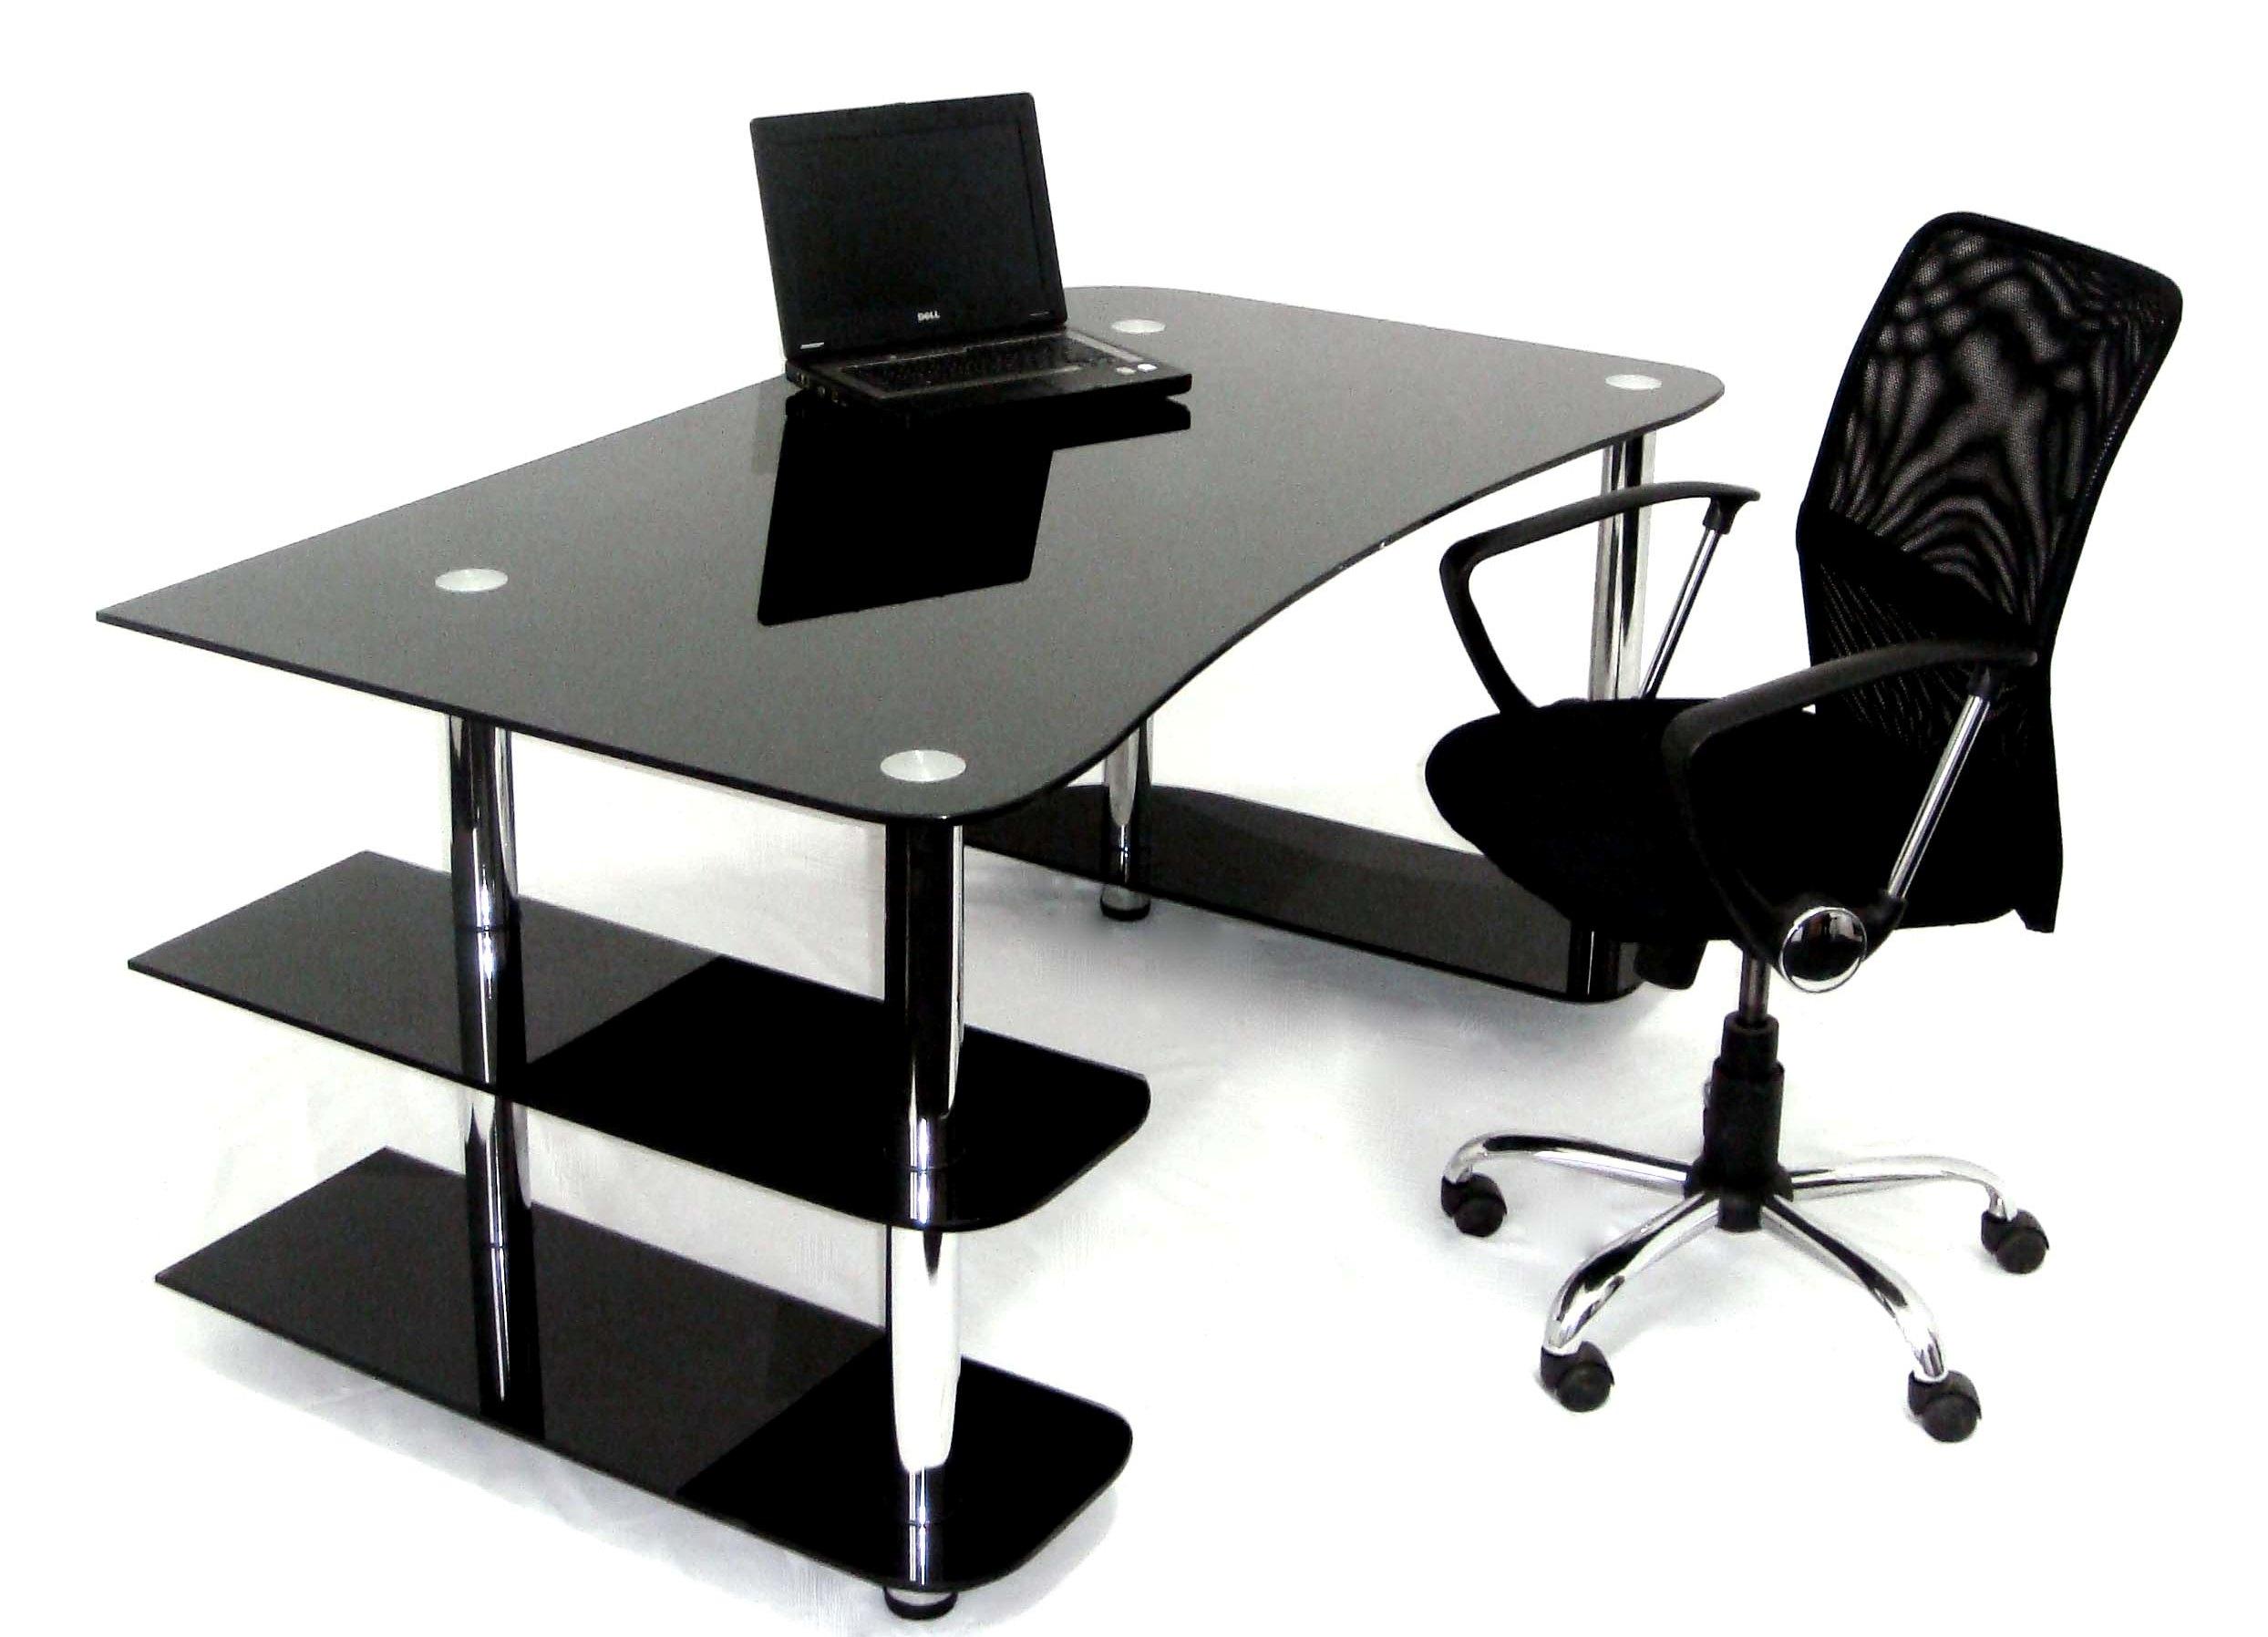 Белый компьютерный стол фото: компьютерные столы угловые, ку.